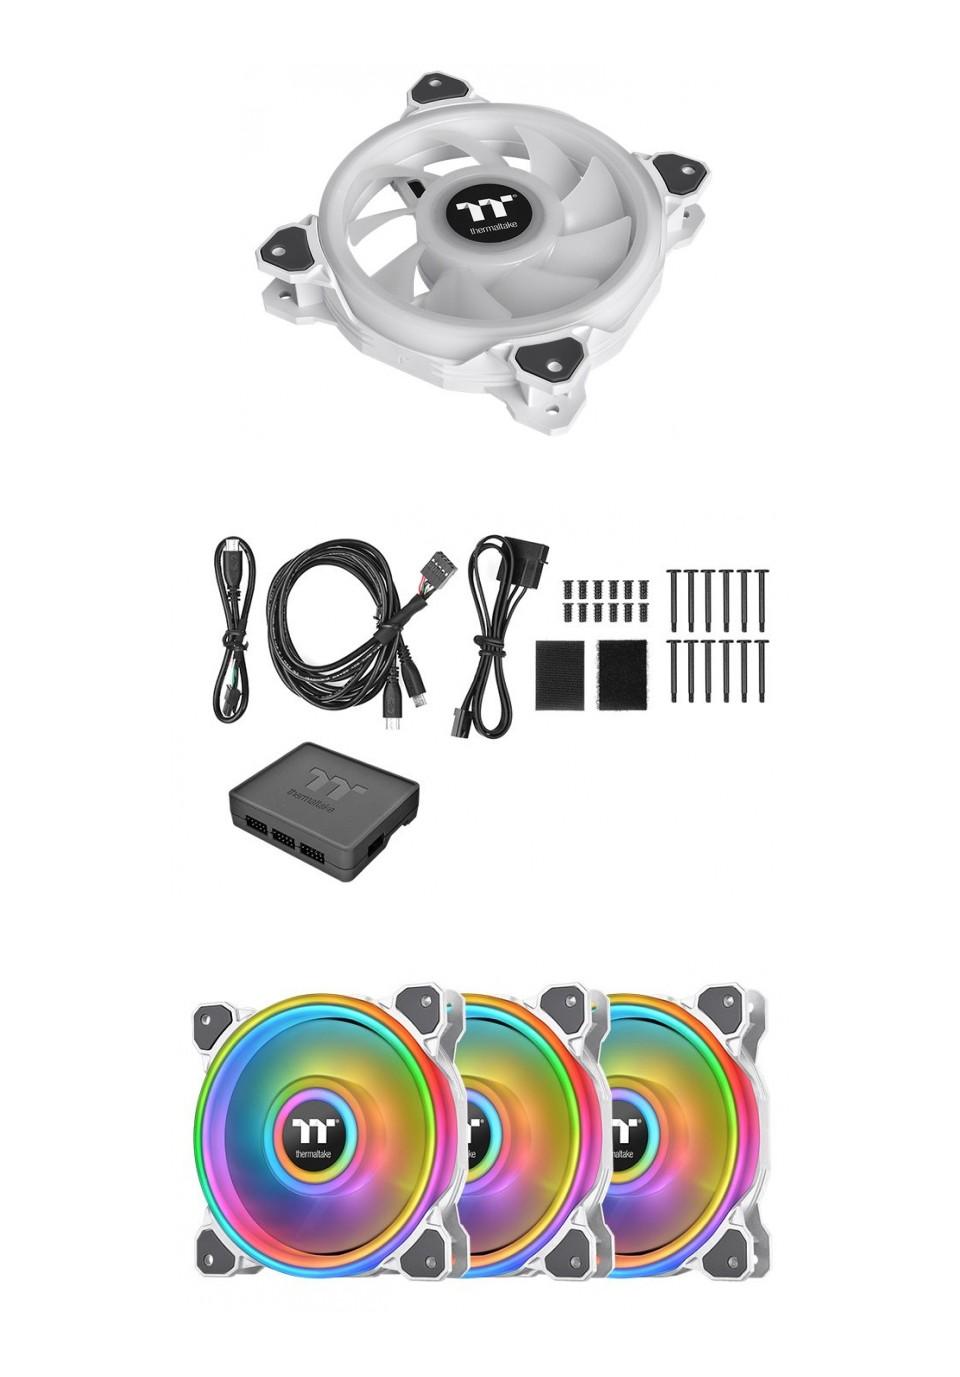 Thermaltake Riing Quad 12 RGB Radiator 120MM Fan 3 Pack White product